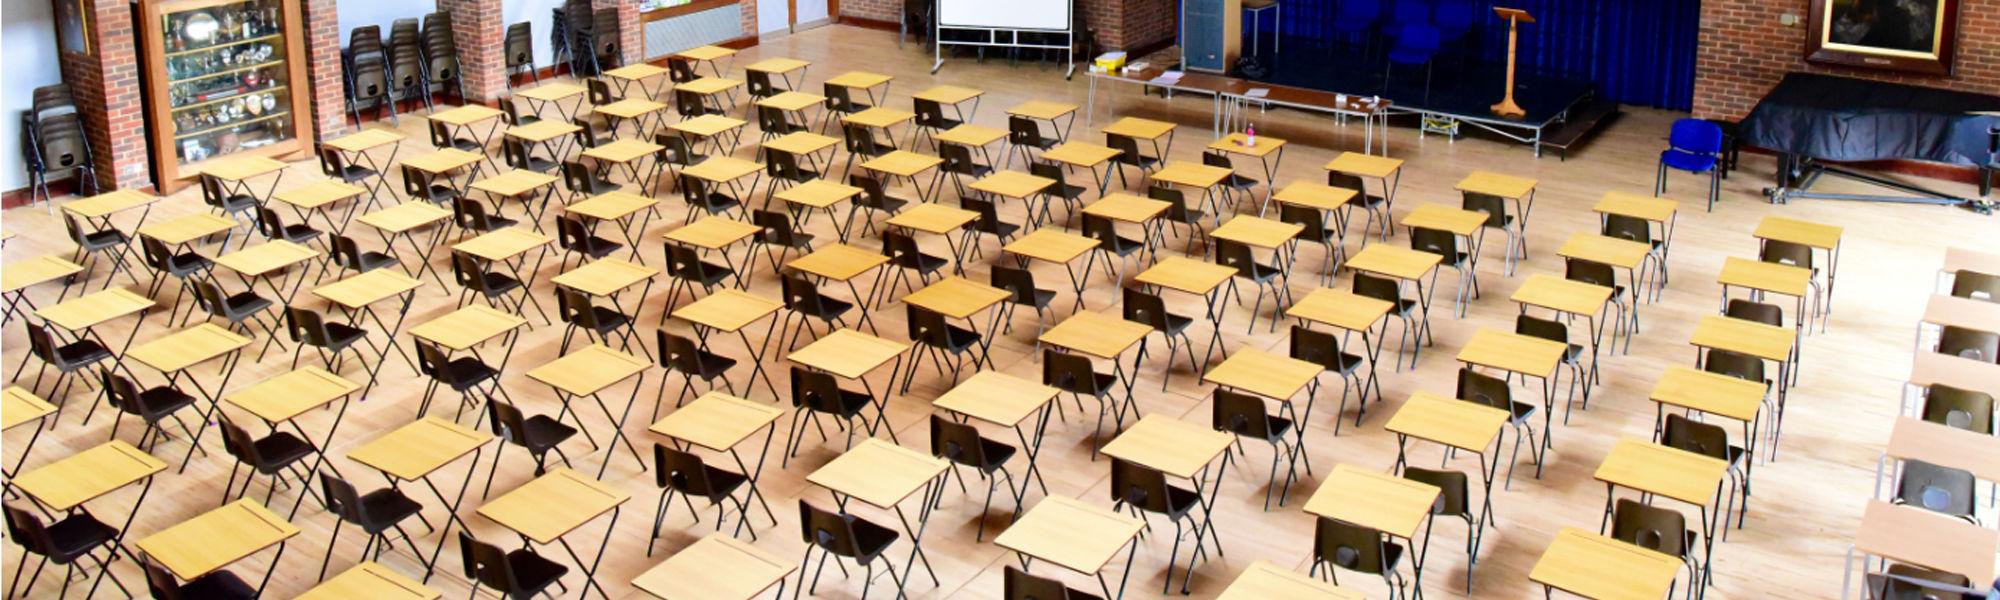 Exams header